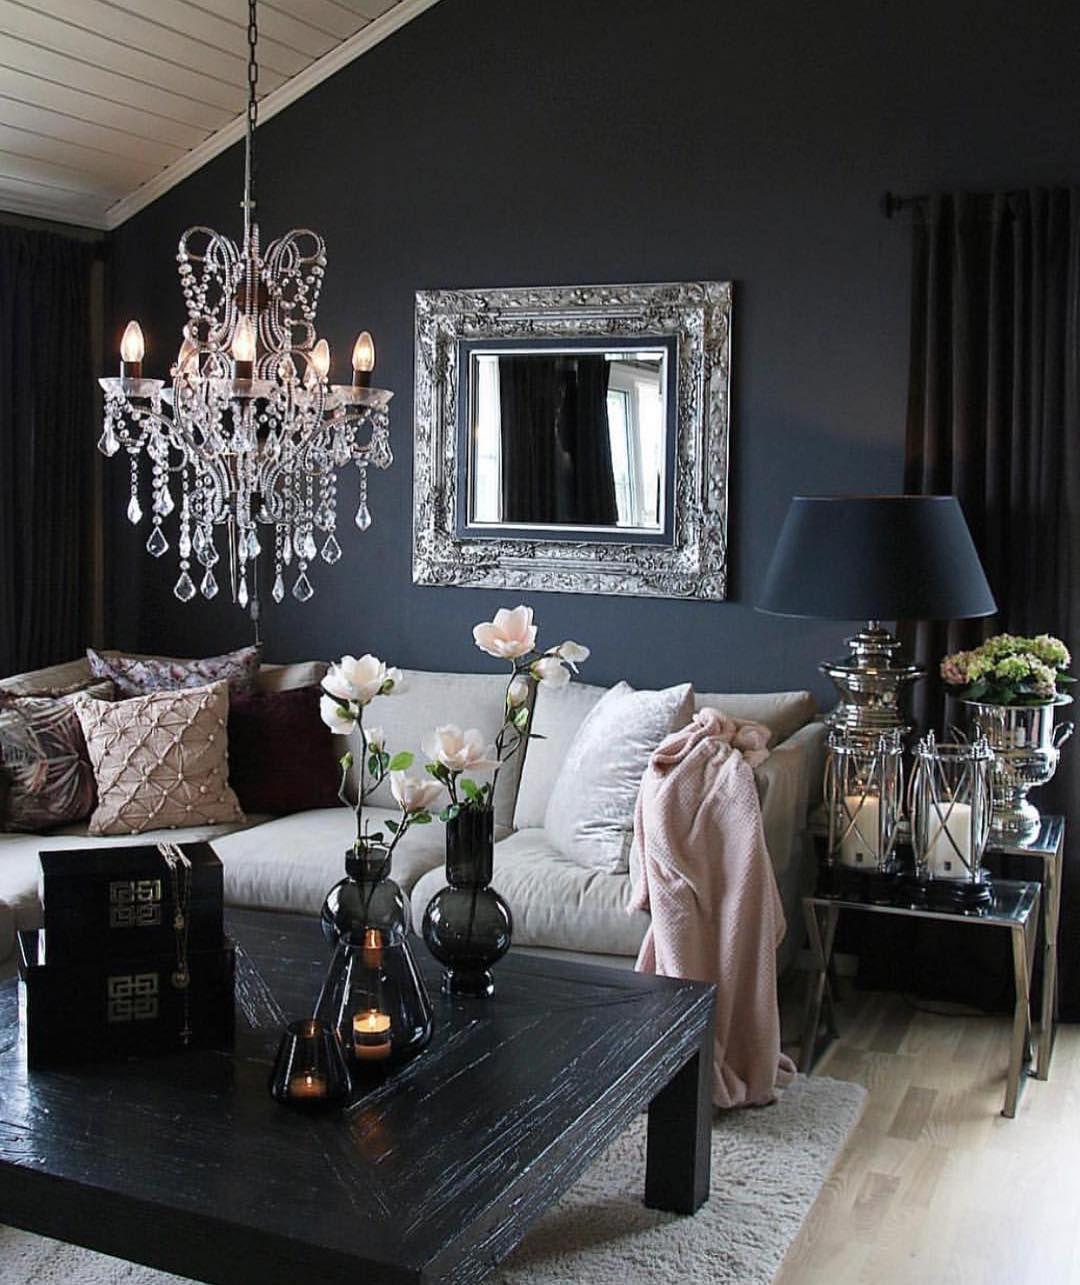 Glam Home Interior Design On Instagram Follow Glamhomedecorr For More Home Inspiration Credit Sivbu Home Decor Living Room Ideas 2019 House Interior